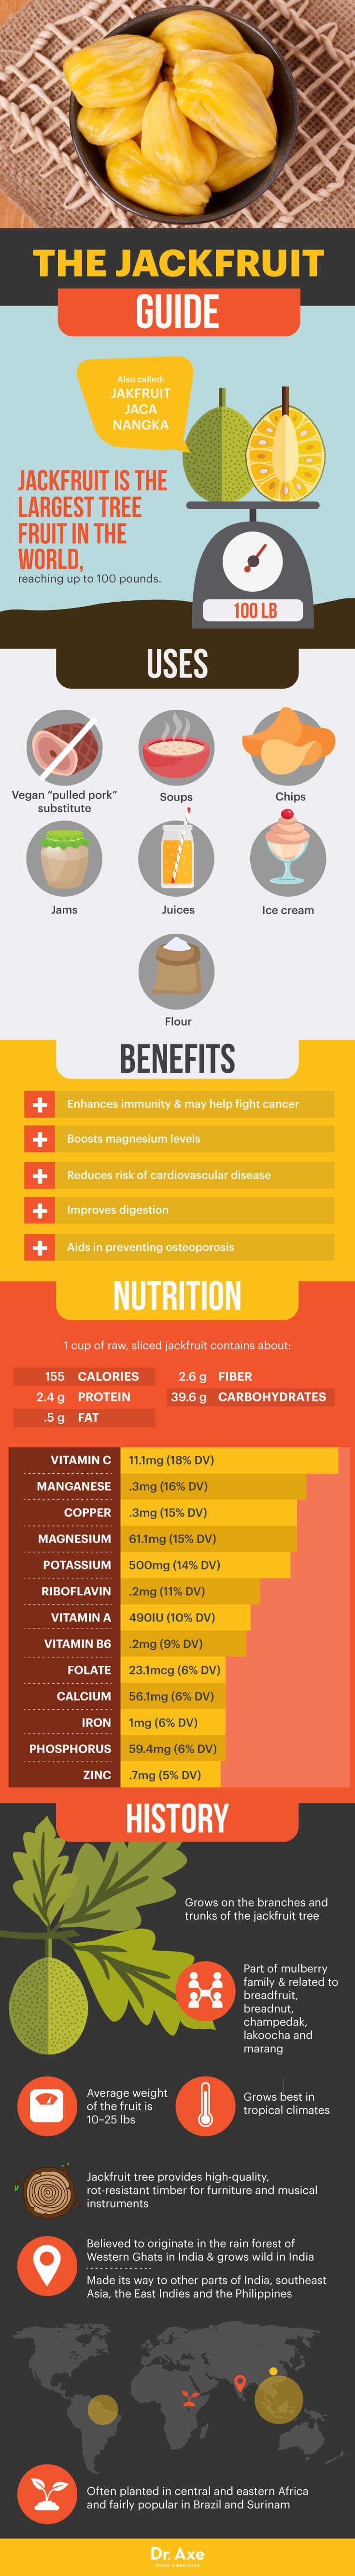 The jackfruit guide - Dr. Axe http://www.draxe.com #health #holistic #natural